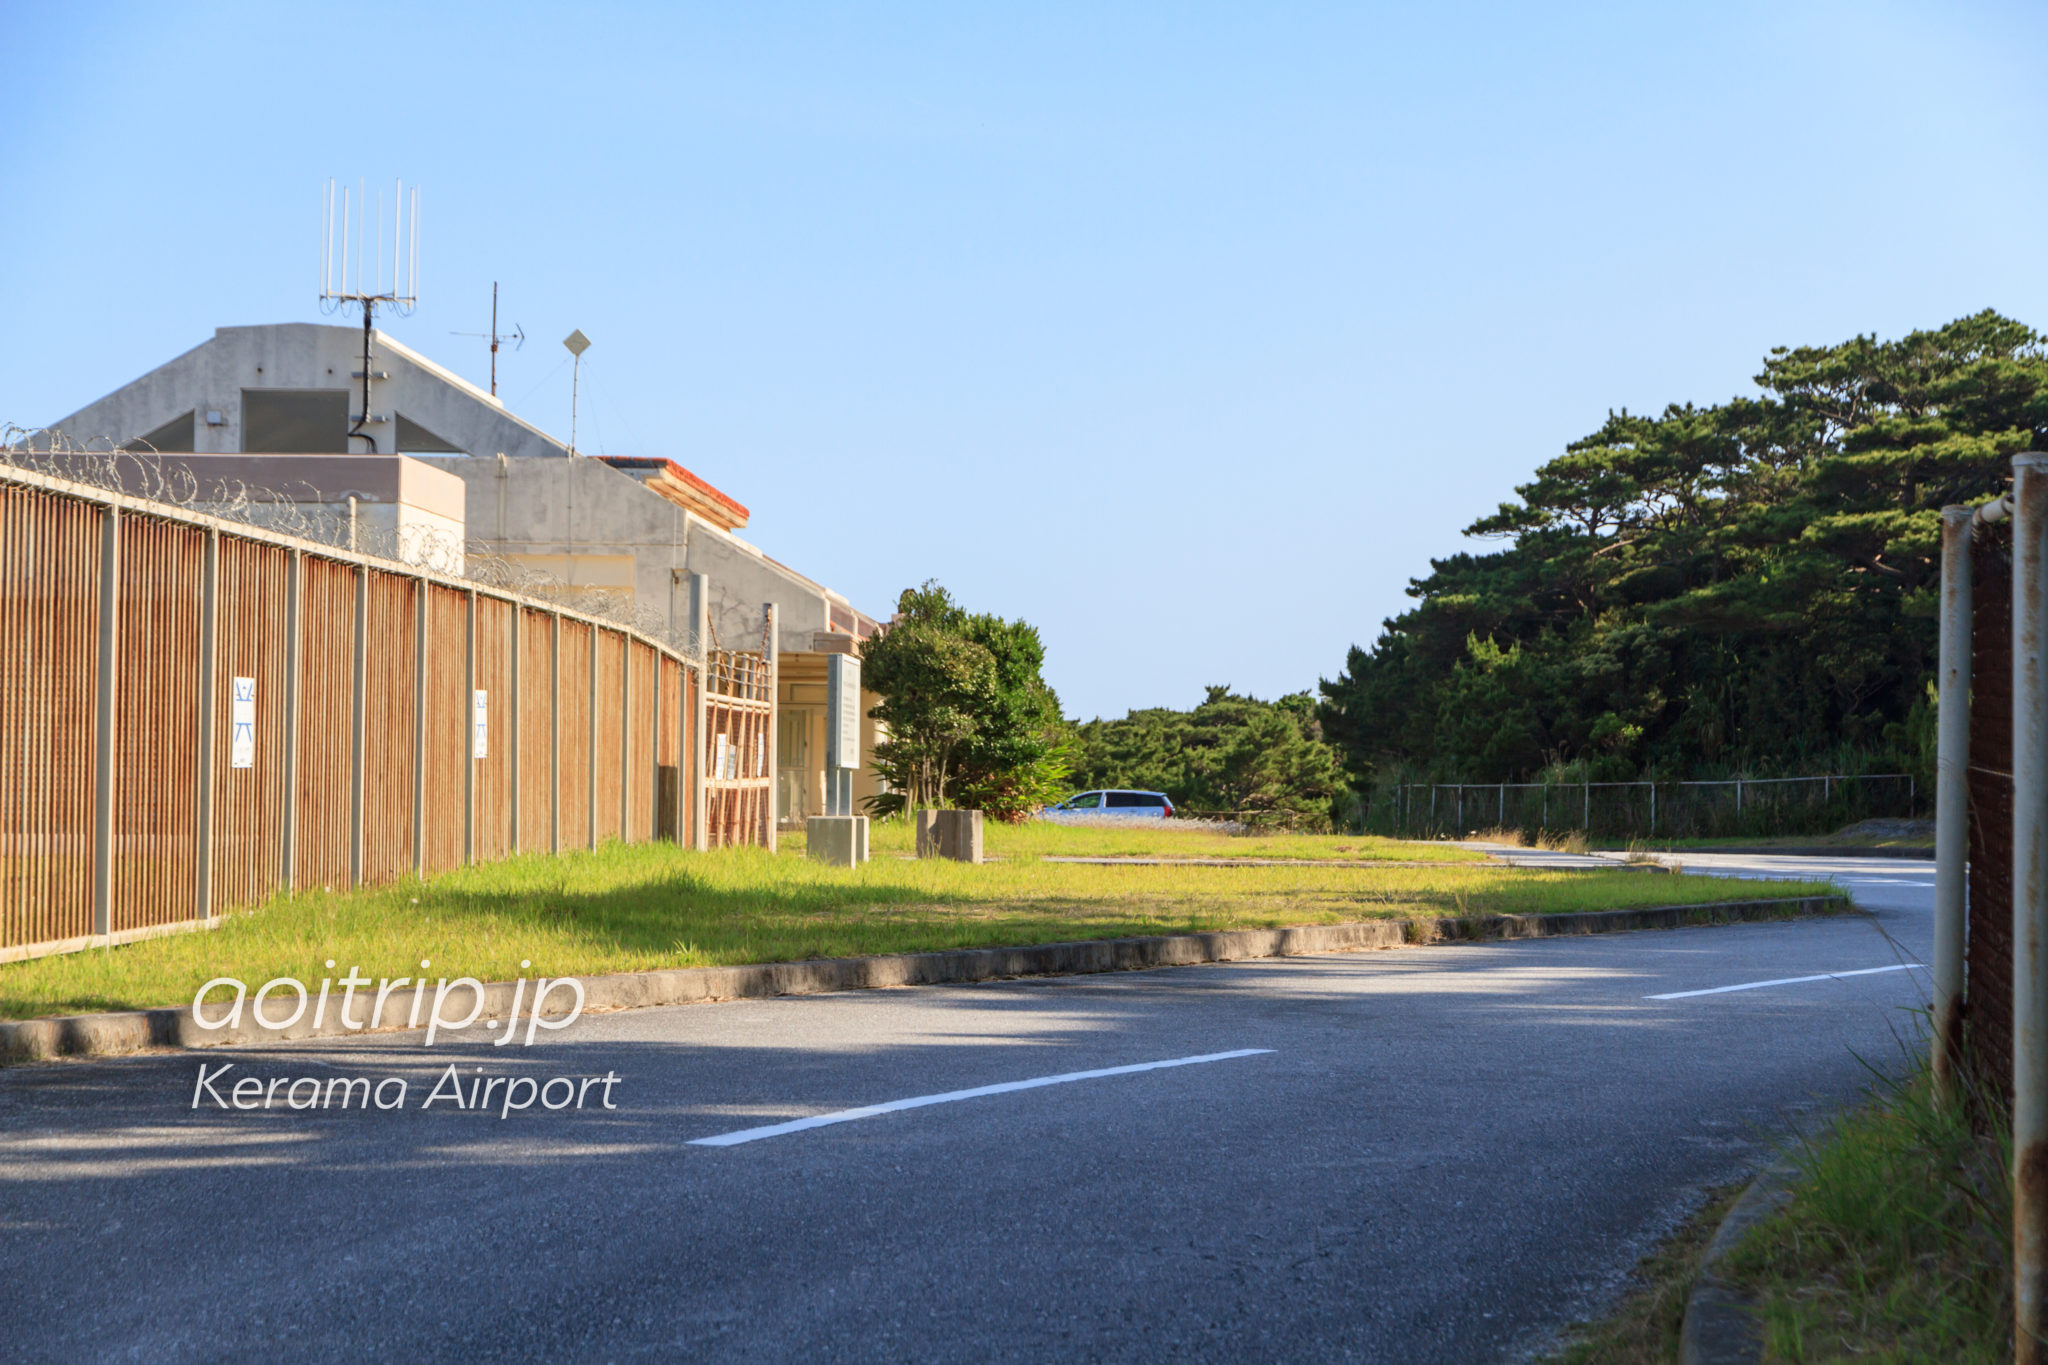 慶良間空港 Kerama Airport